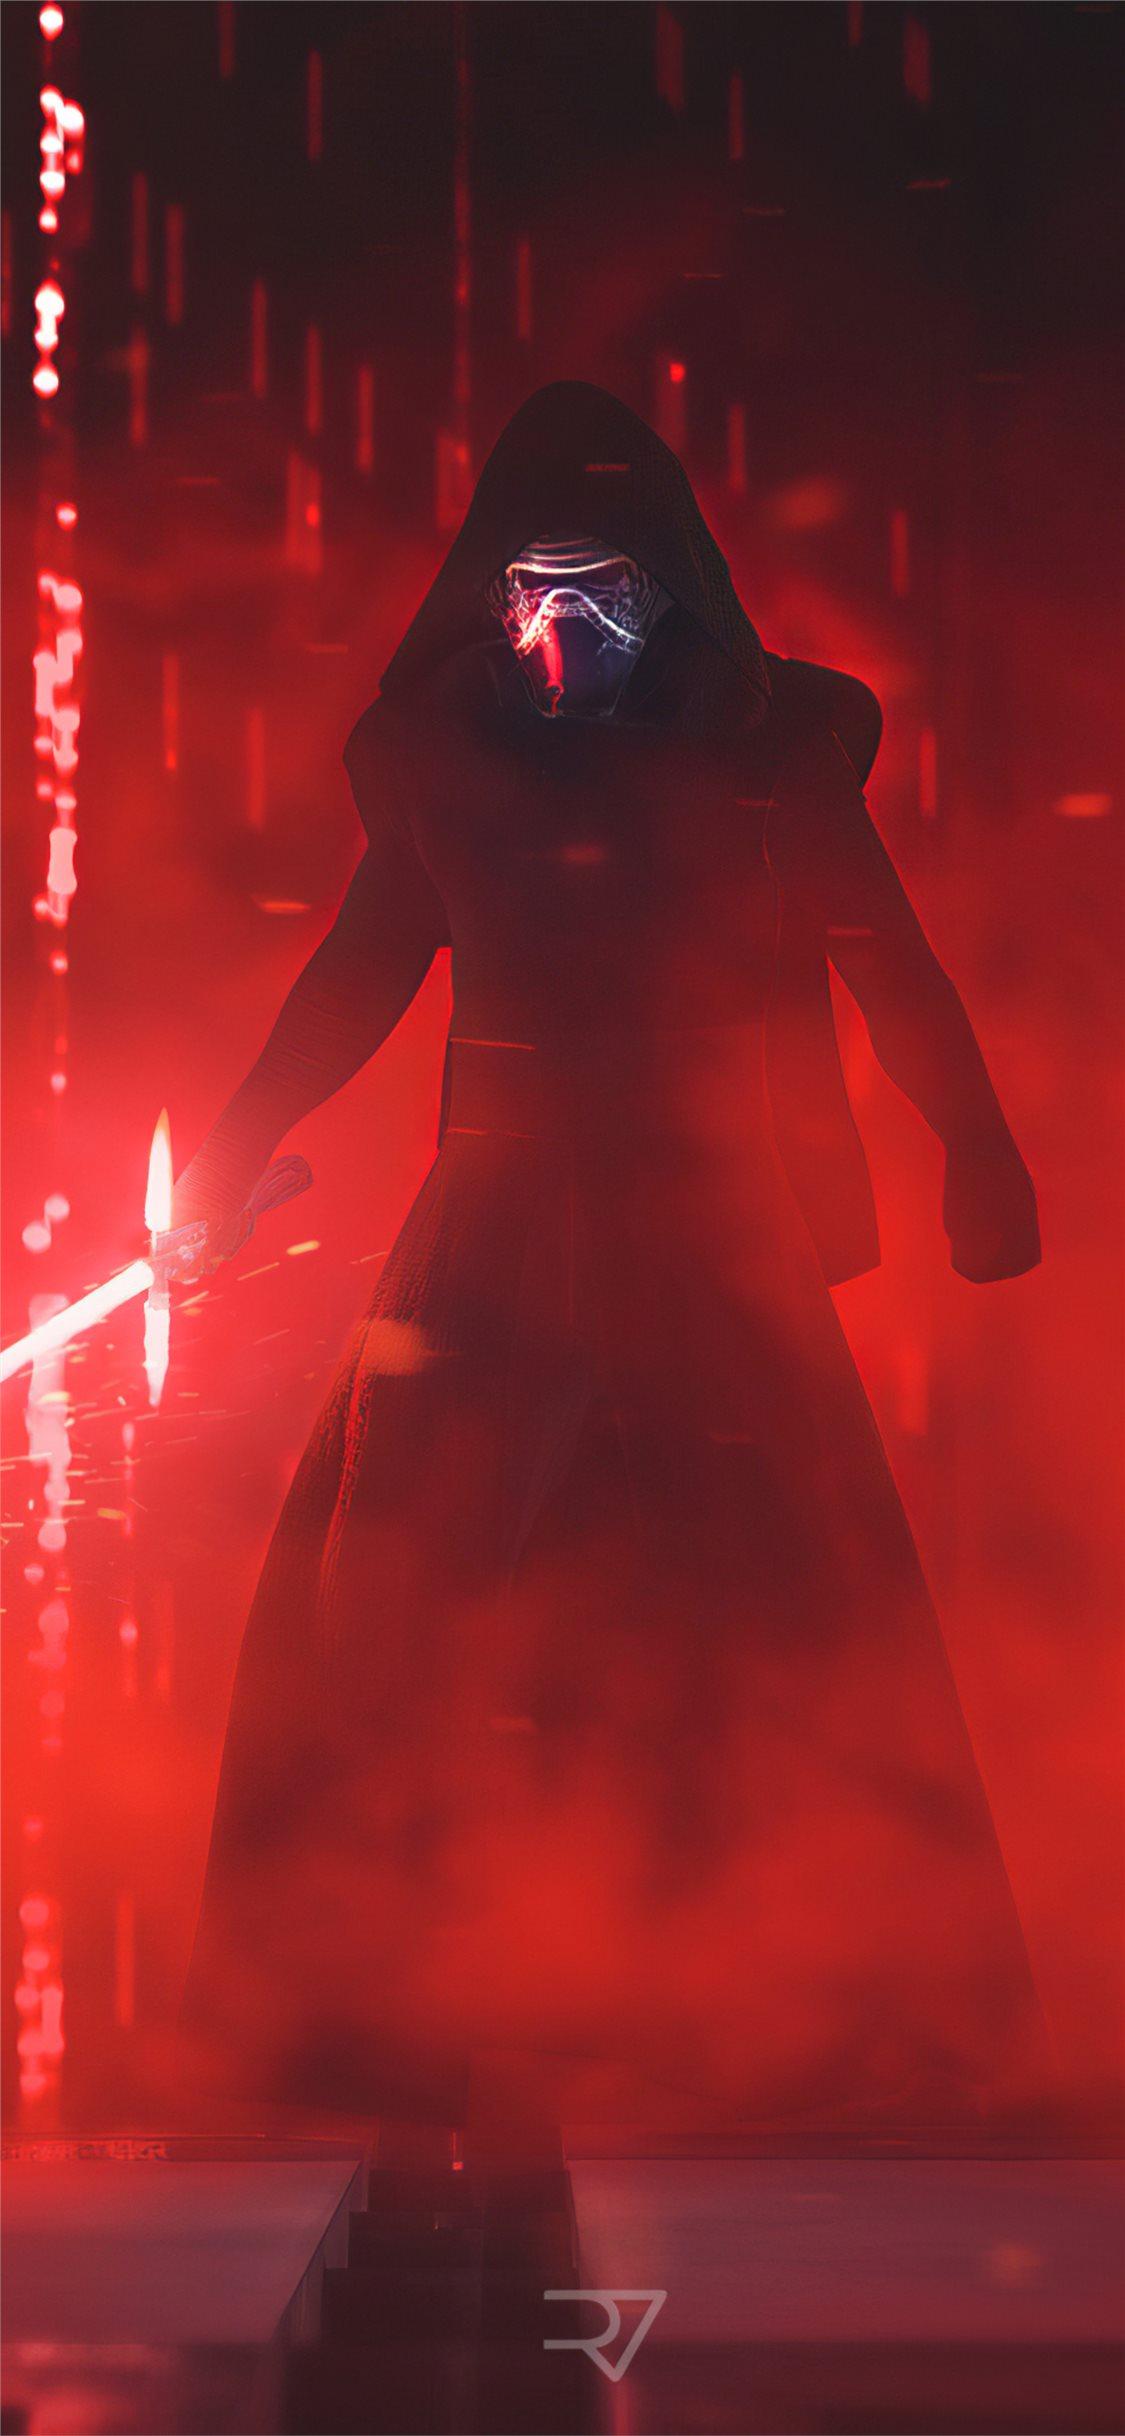 Darth Vader 4k 2019 Iphone X Wallpapers Free Download